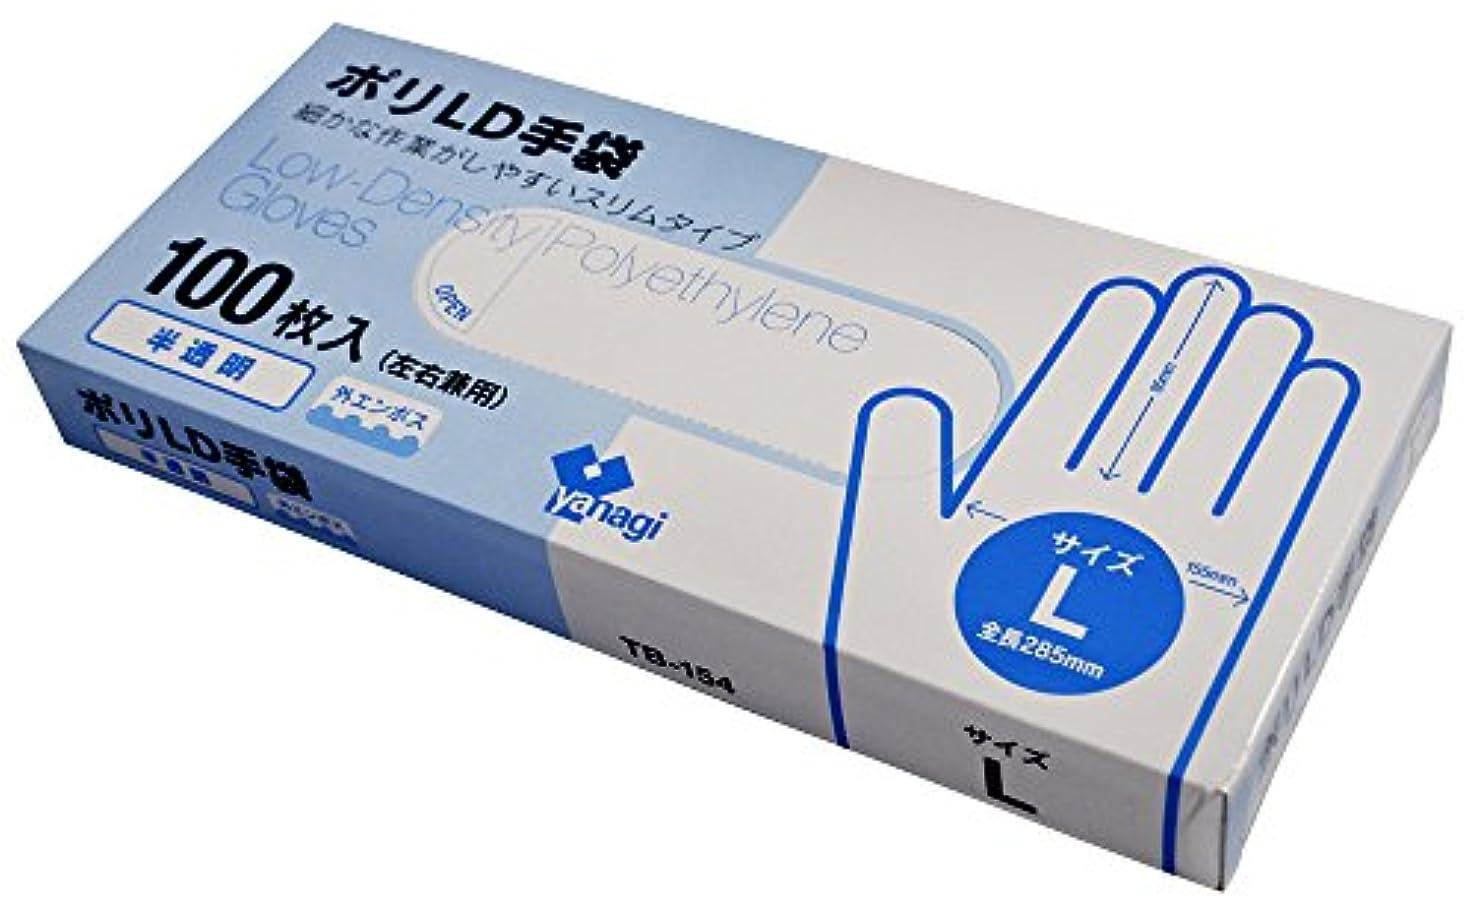 葬儀枢機卿判決使い捨て ポリLD手袋 半透明 左右兼用 Lサイズ 100枚入 食品衛生法規格基準適合品 TB-154